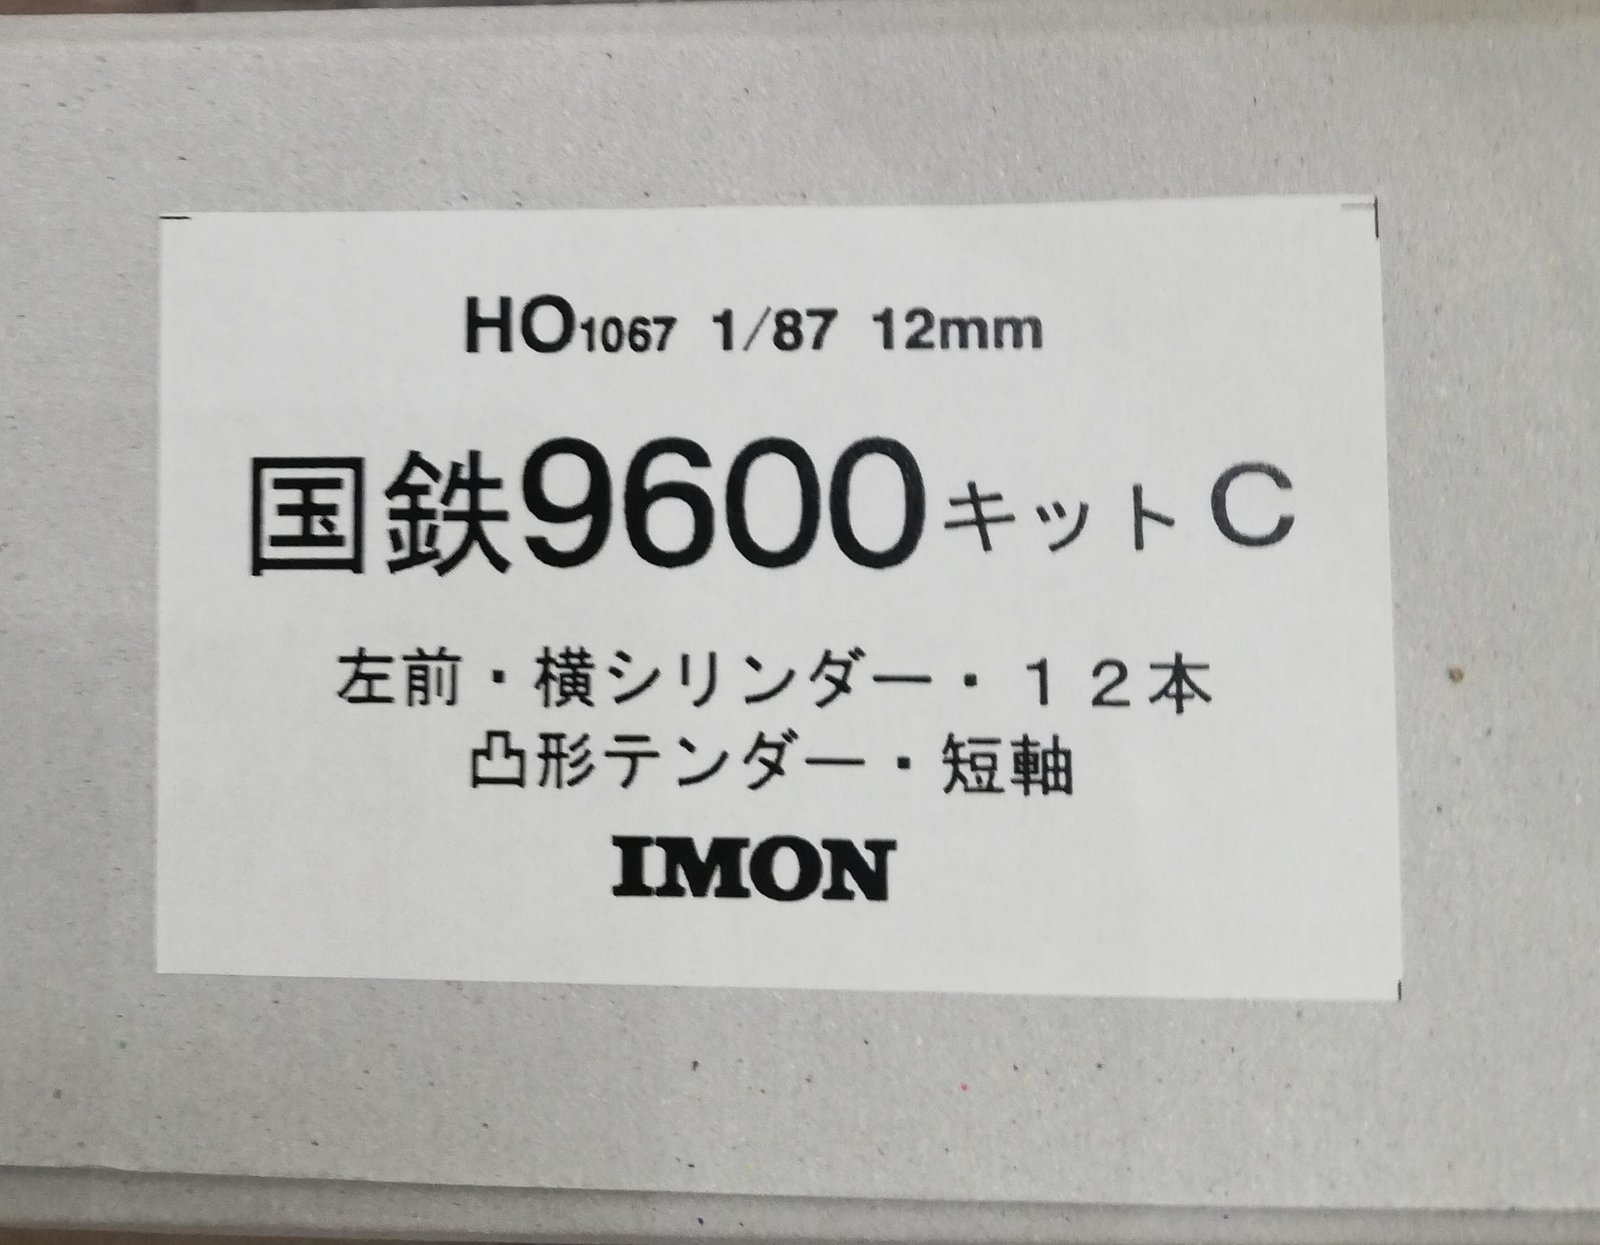 large.imon_9600_c_label.jpg.44e9736cdb08